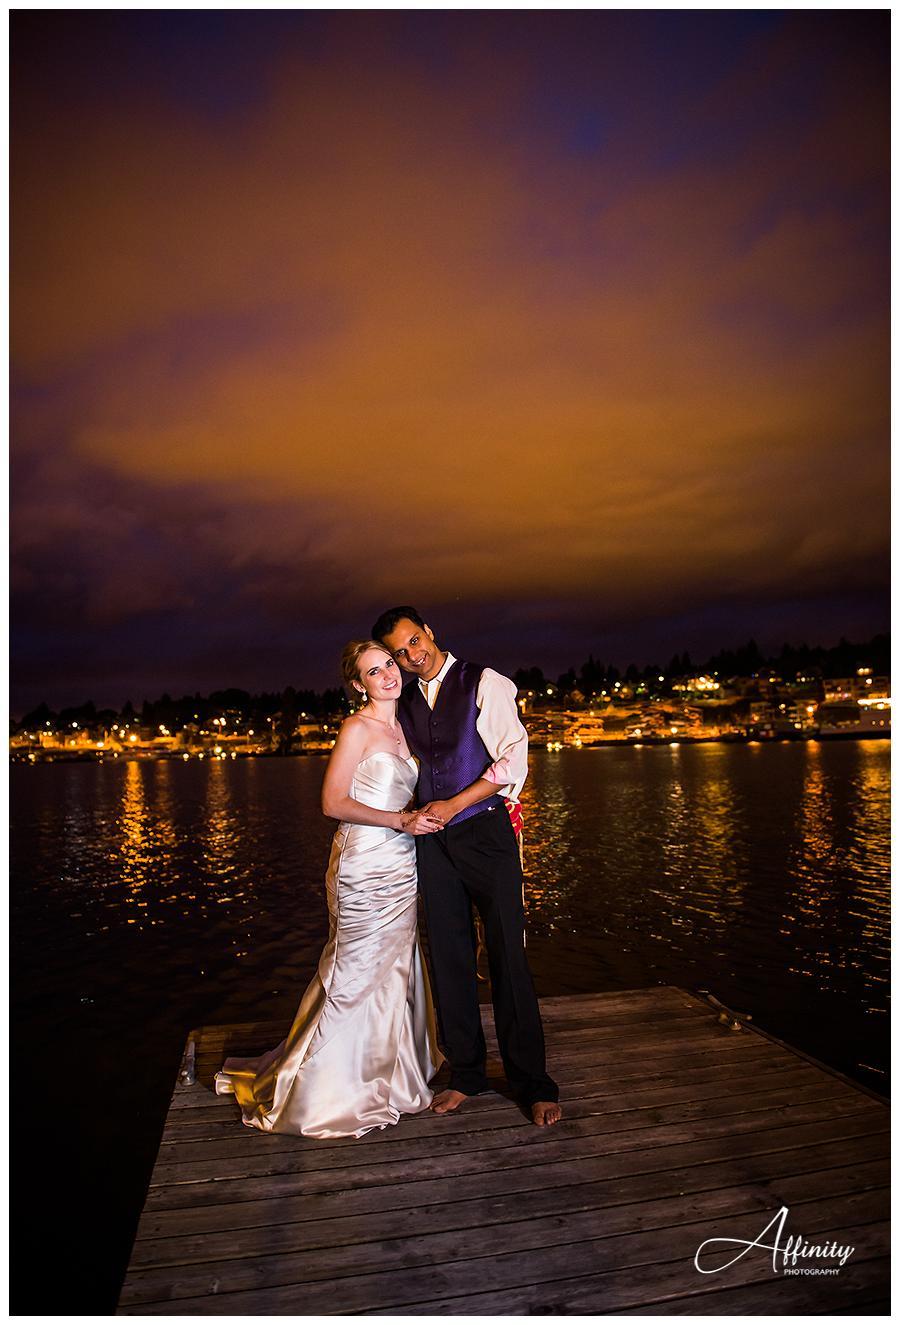 37-bride-groom-lake-washington-night.jpg